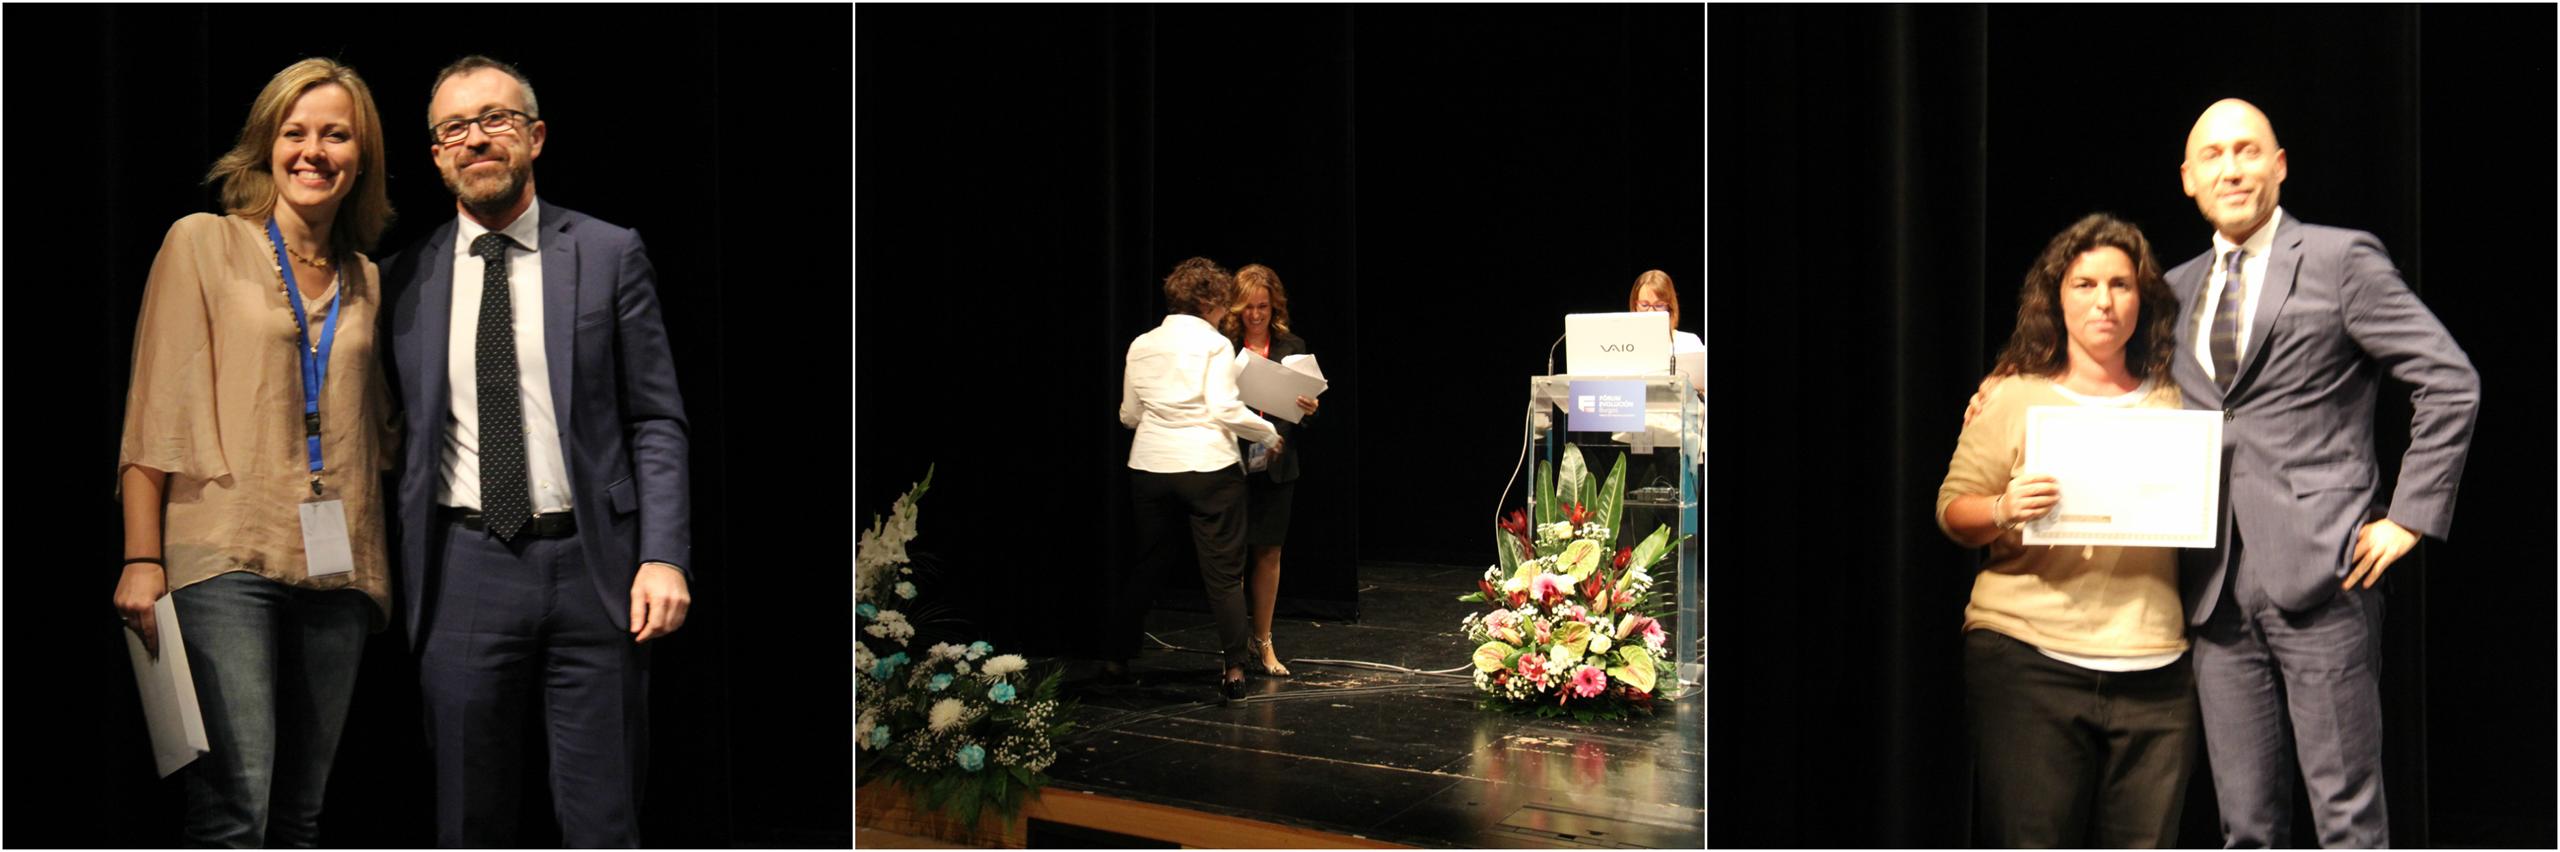 Tres projectes d'infermeres de Barcelona, premiats al 42è Congrés Nacional de la Sociedad Española de Enfermería Nefrológica